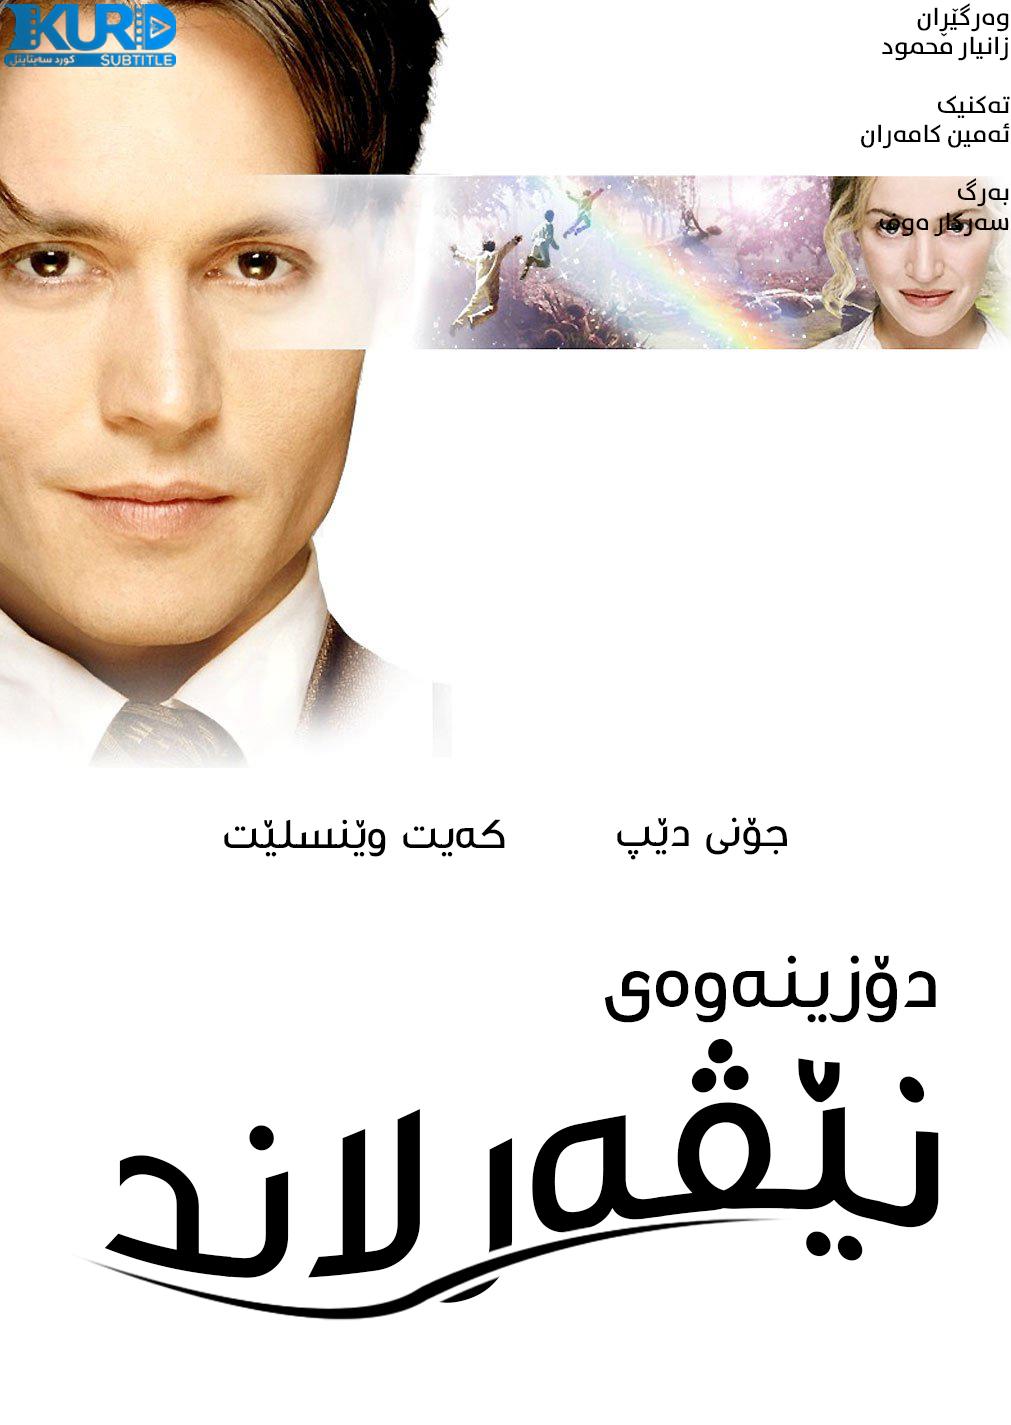 Finding Neverland kurdish poster